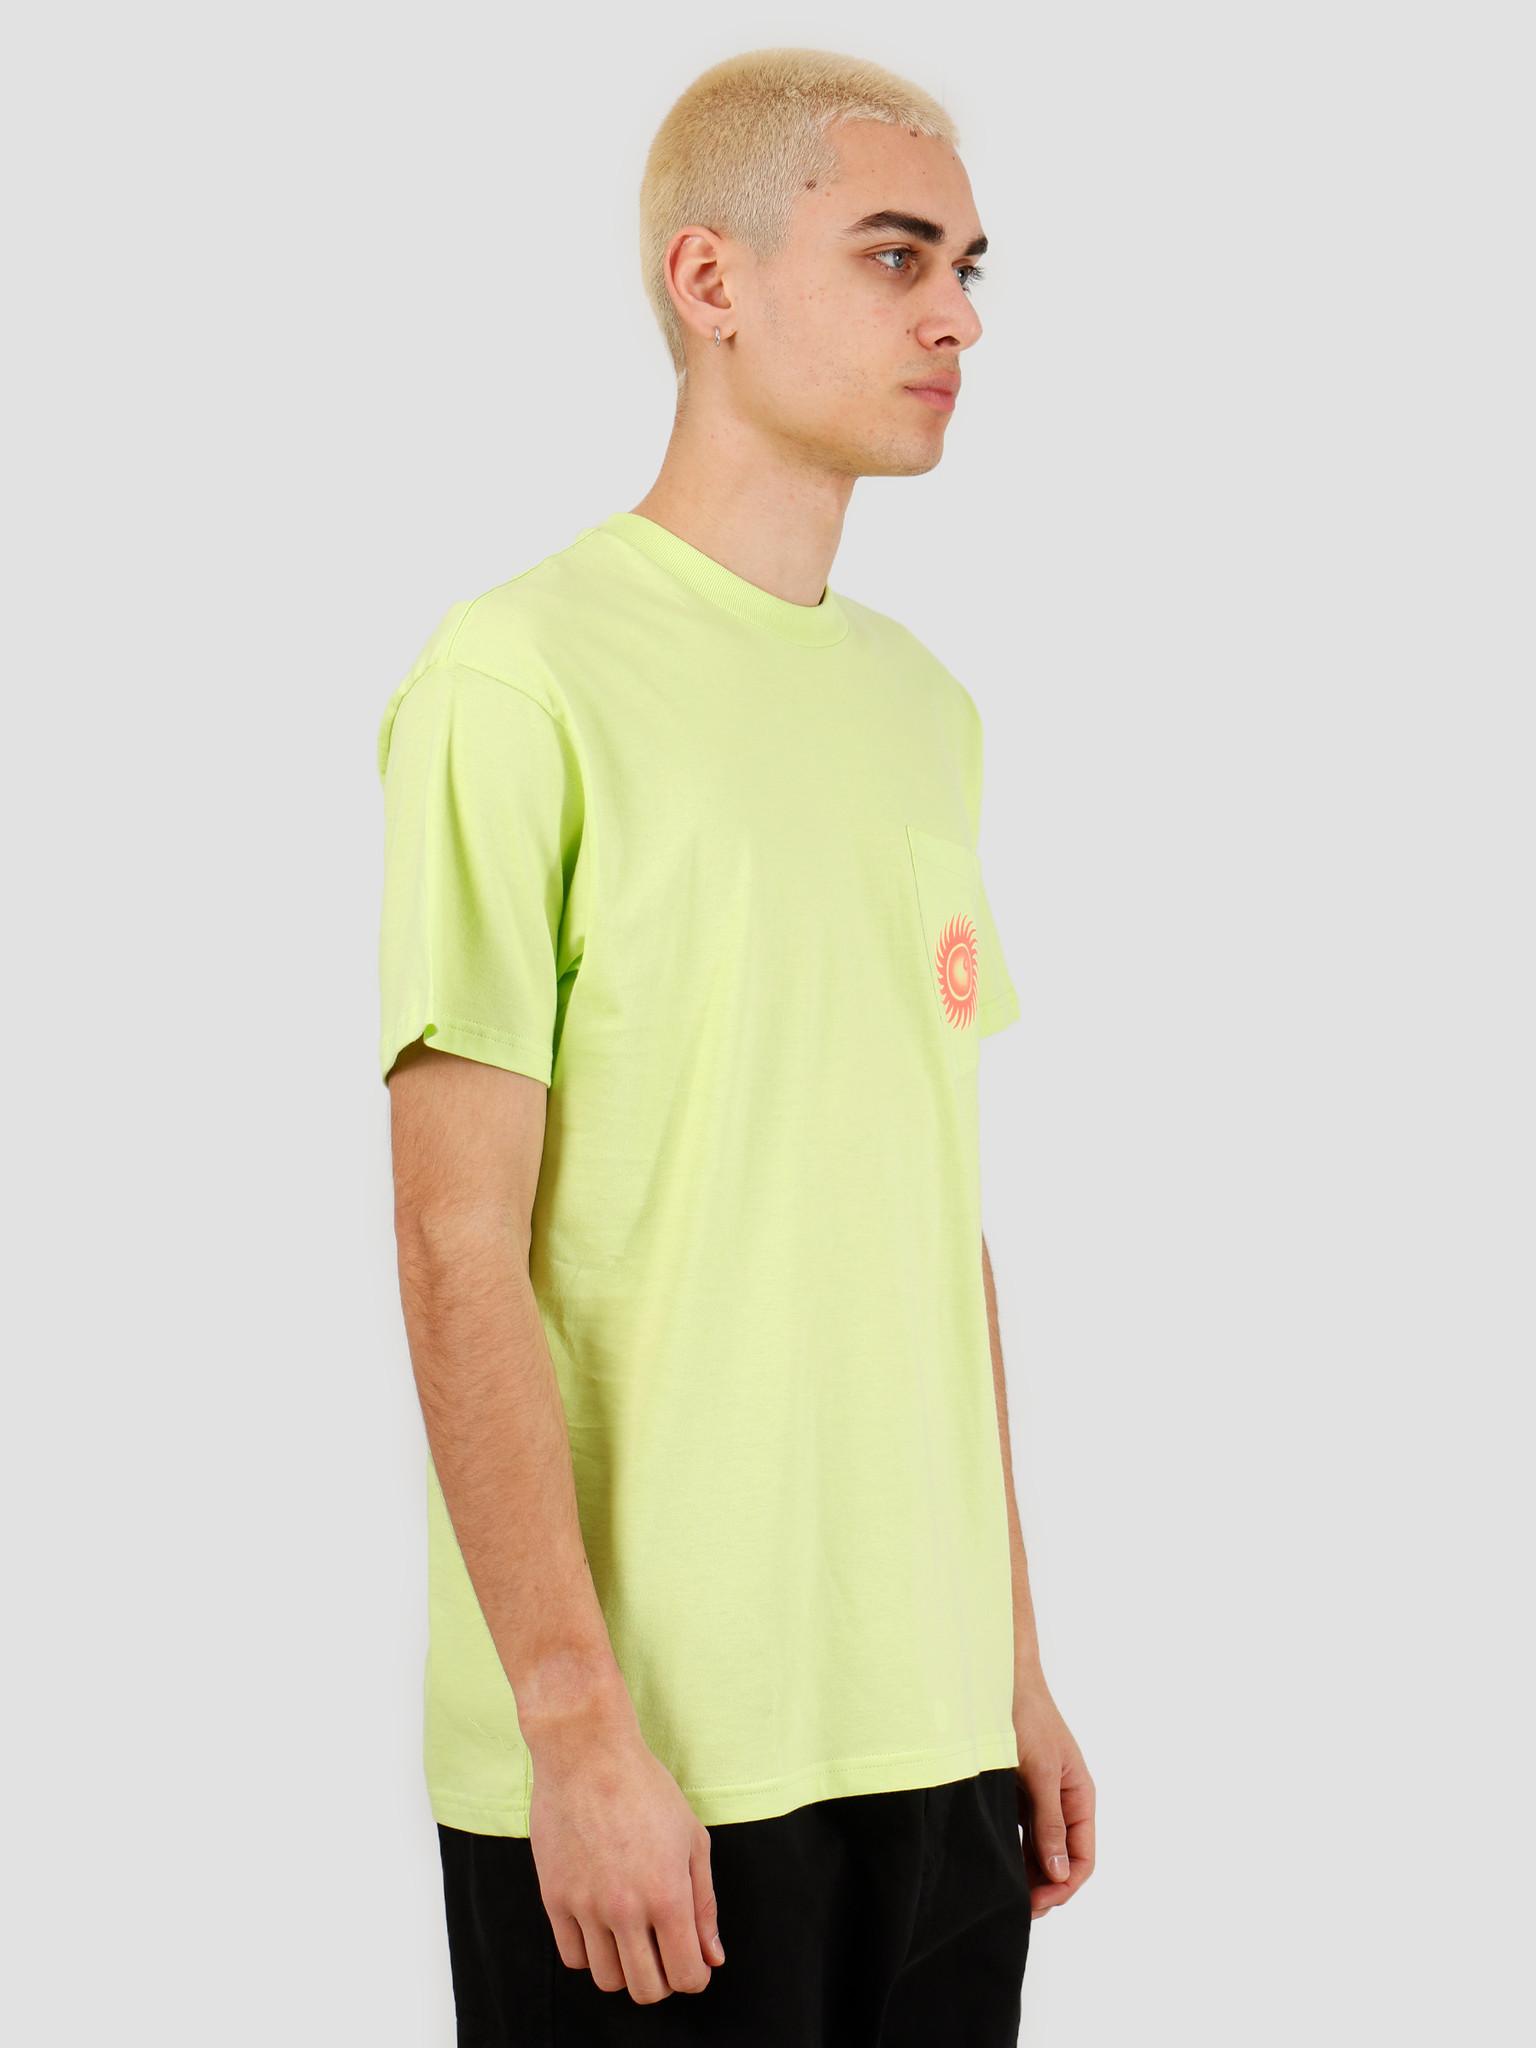 Carhartt WIP Carhartt WIP Note Pocket T-Shirt Lime I027754-09E00